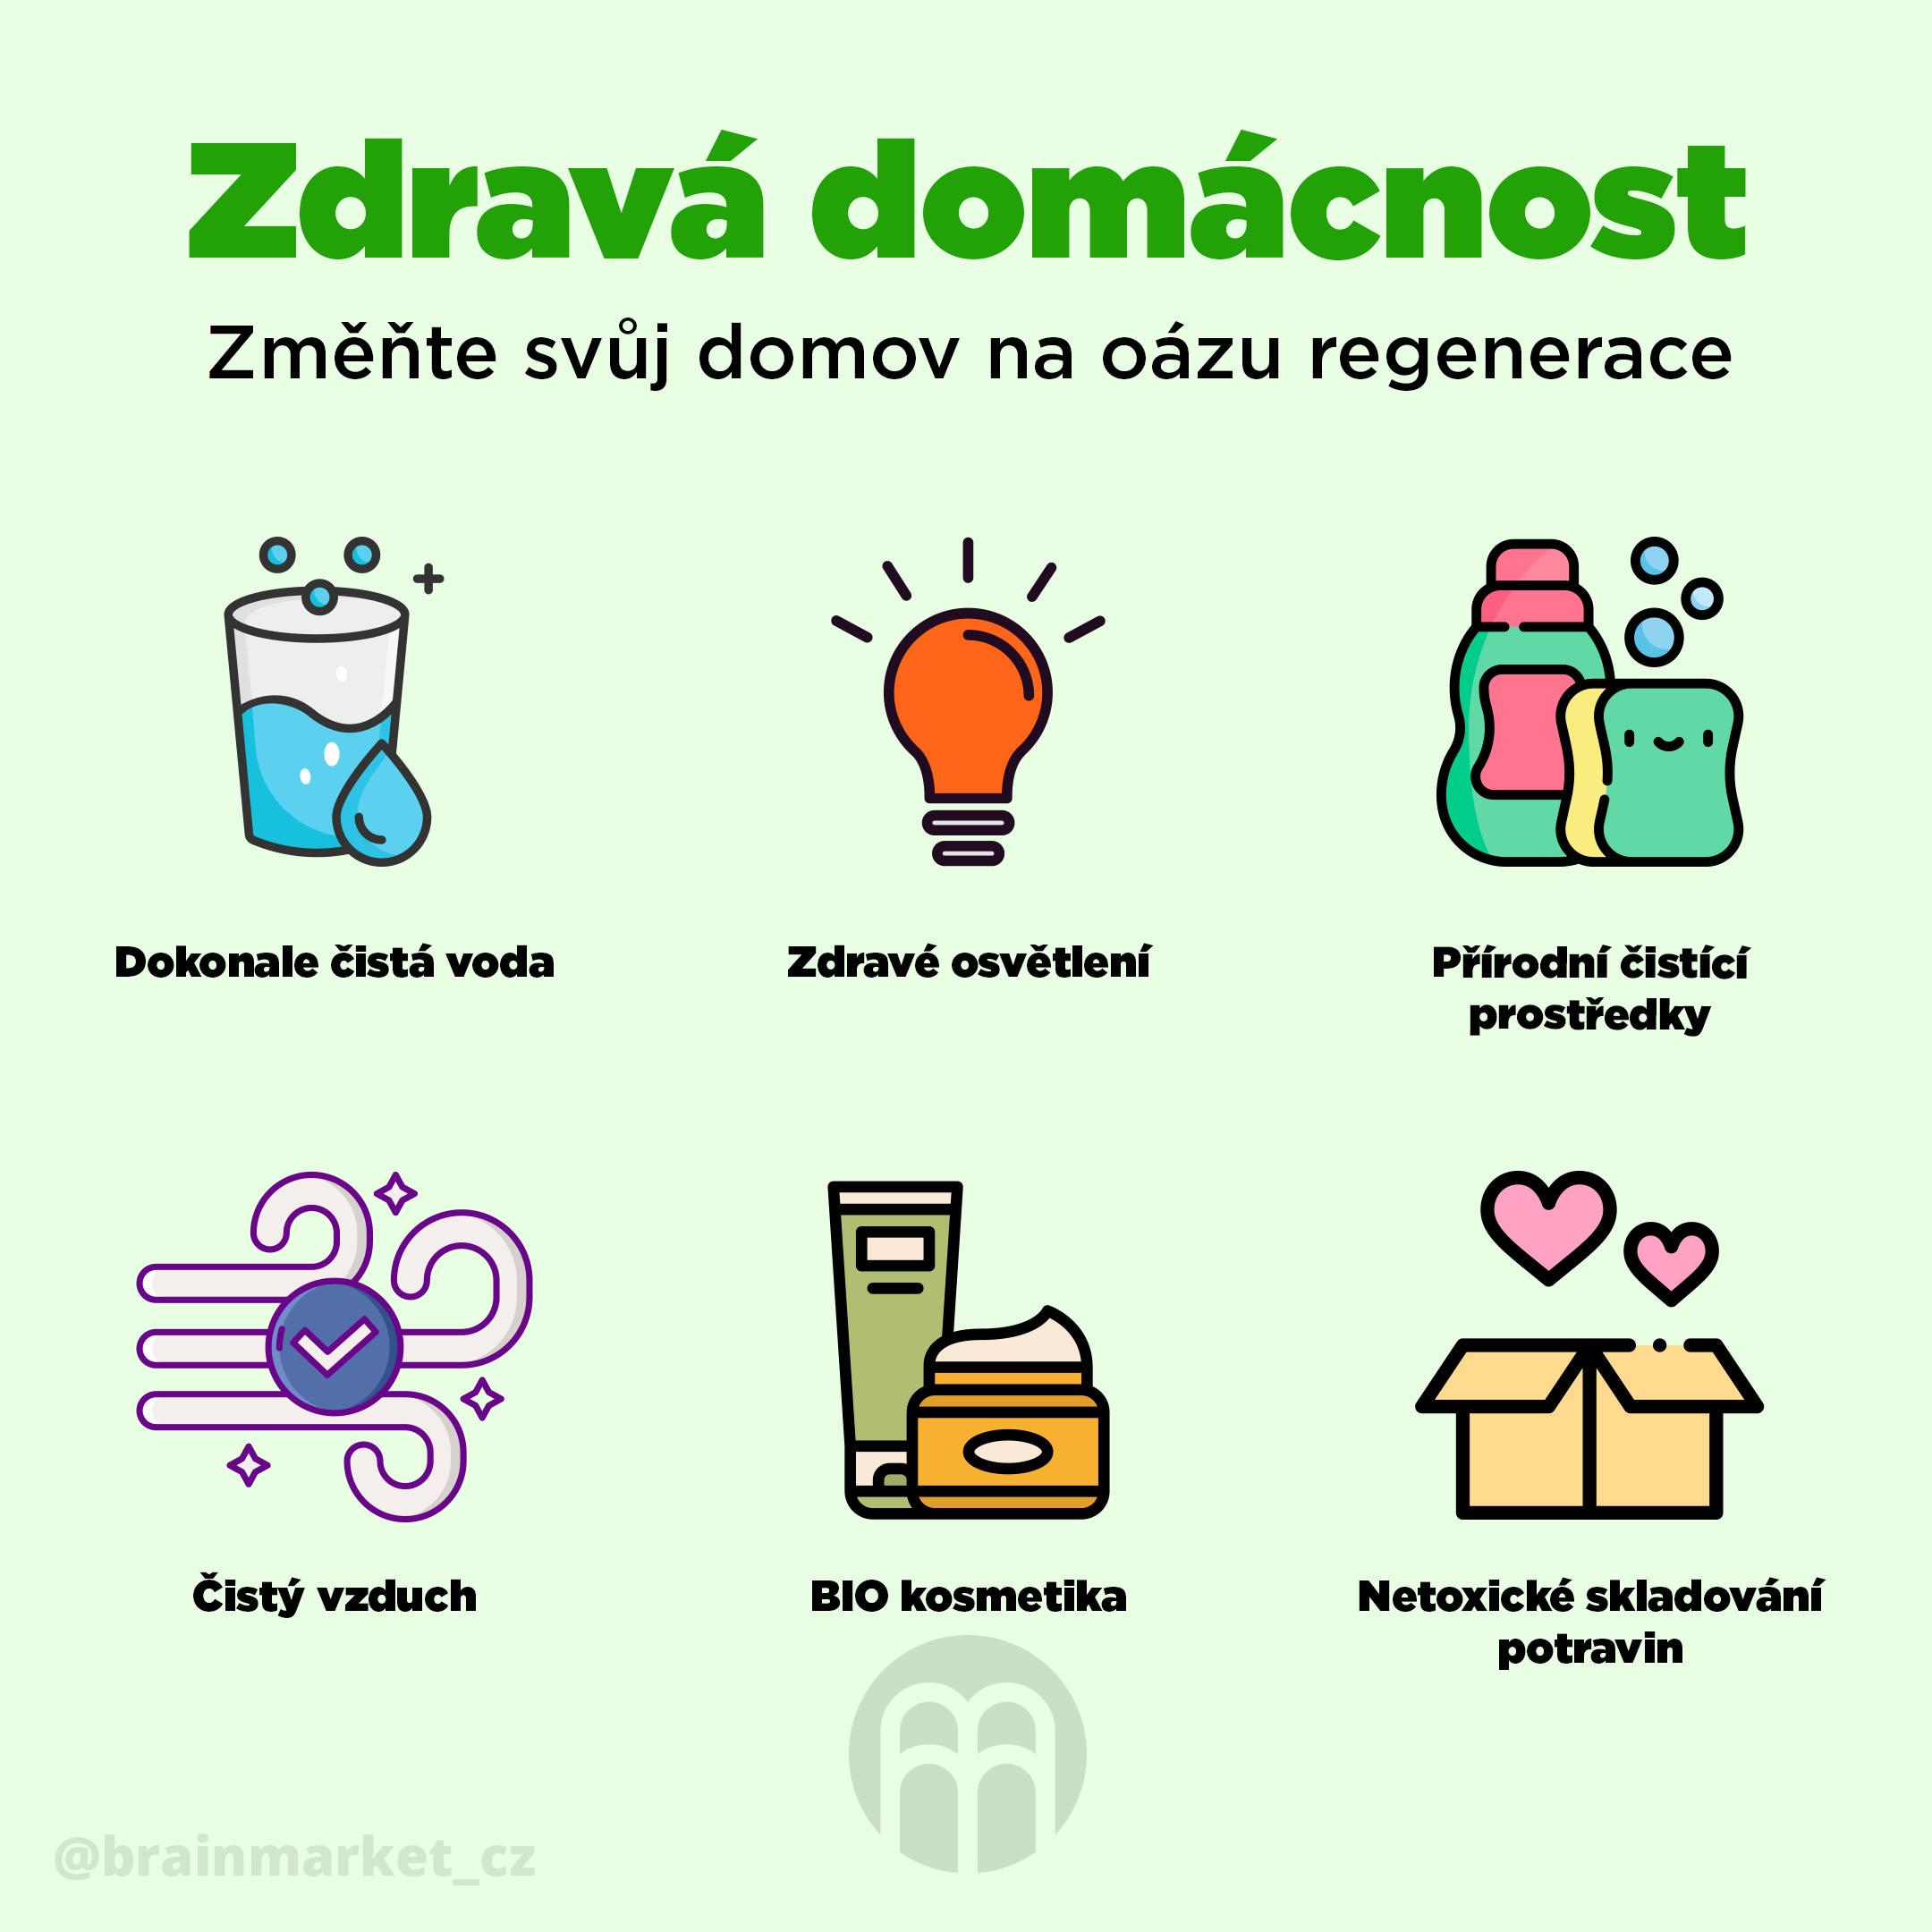 zdrava-domacnost-infografika-brainmarket-2-cz